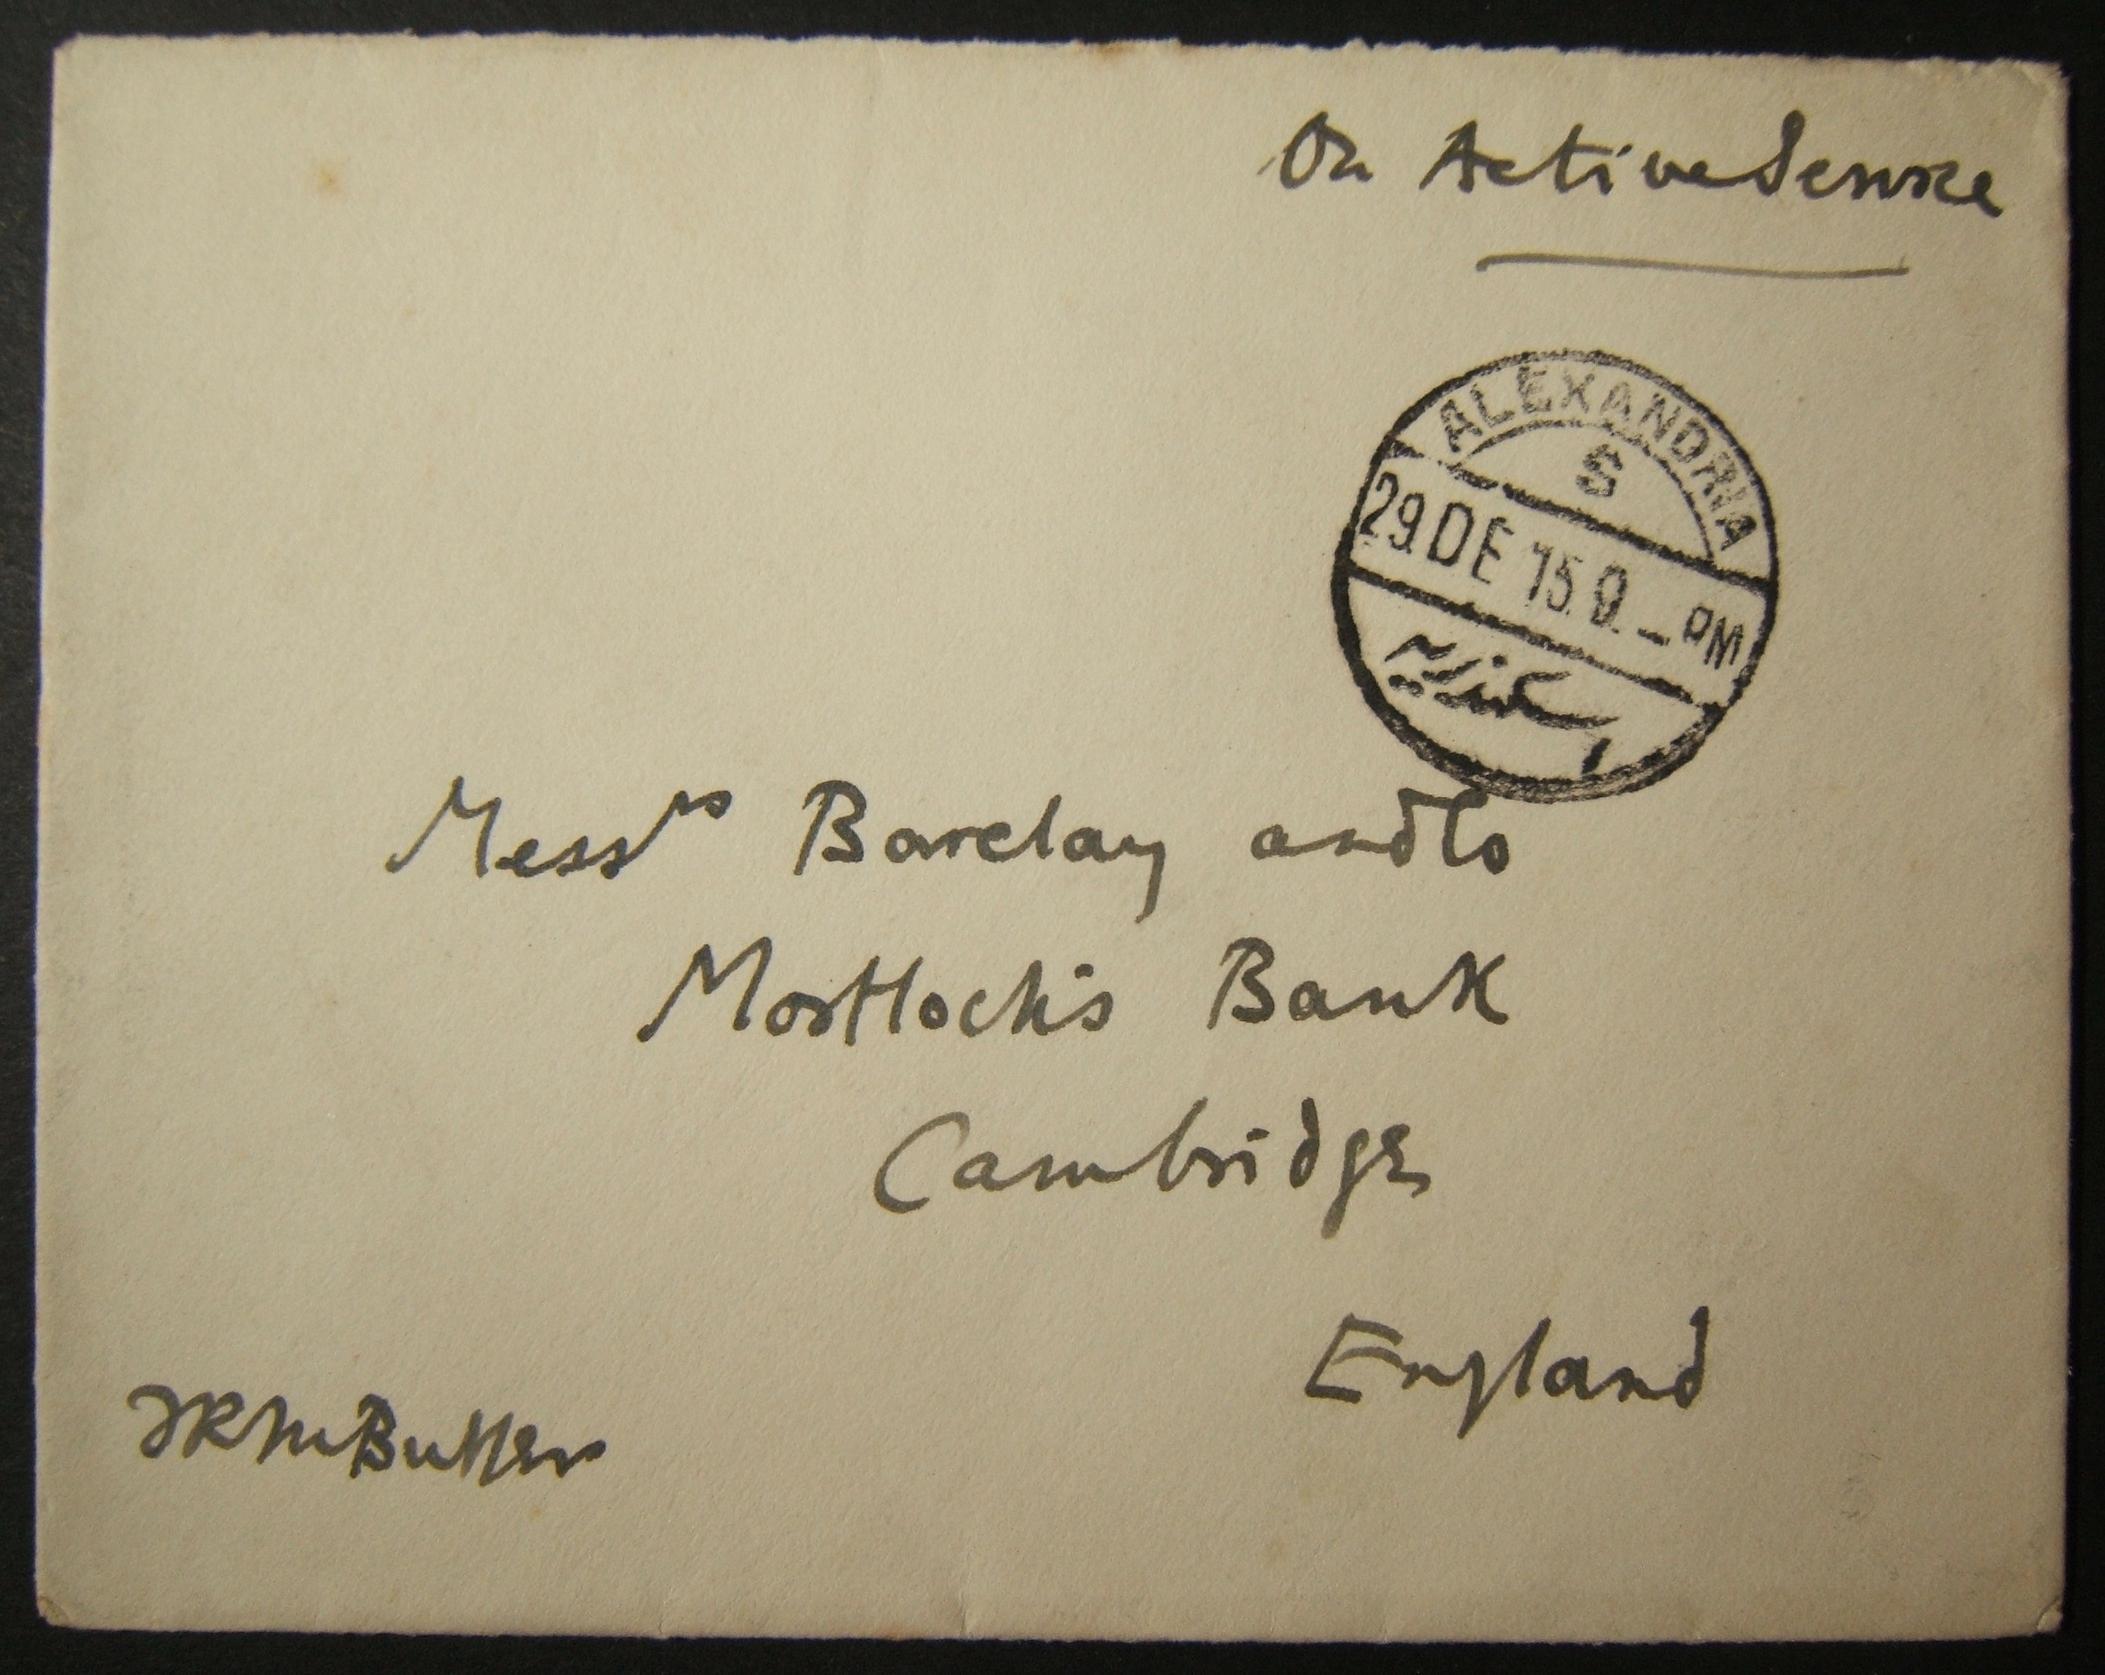 12/1915 WWI unranked דואר צבאי בריטי שנשלח באמצעות הדואר המצרי, עם חותמת הדואר האחרונה